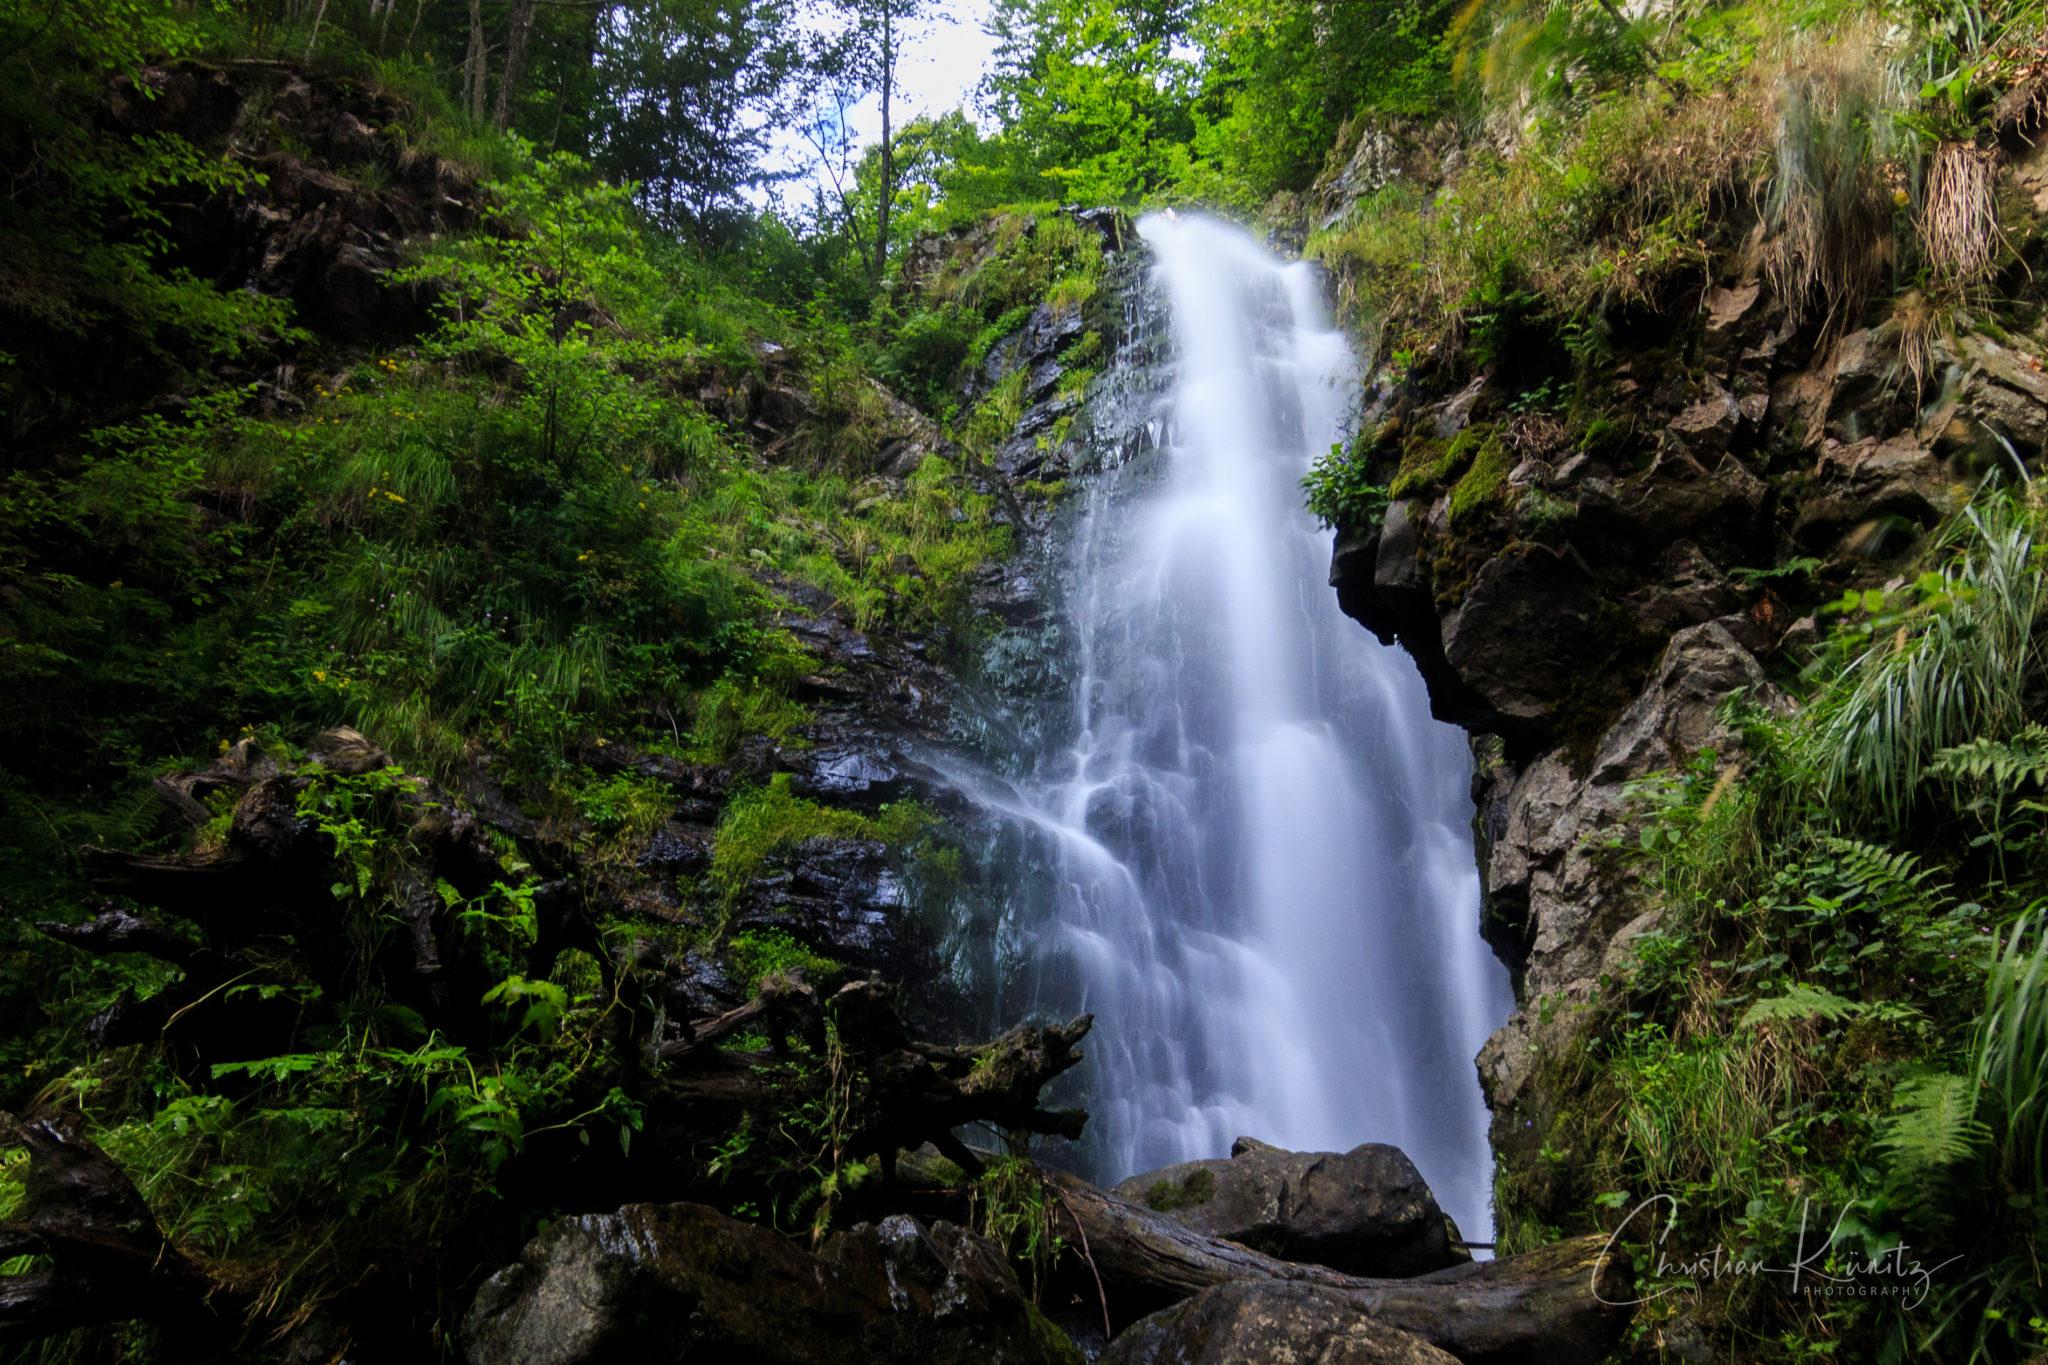 Todtnauer Wasserfall VII